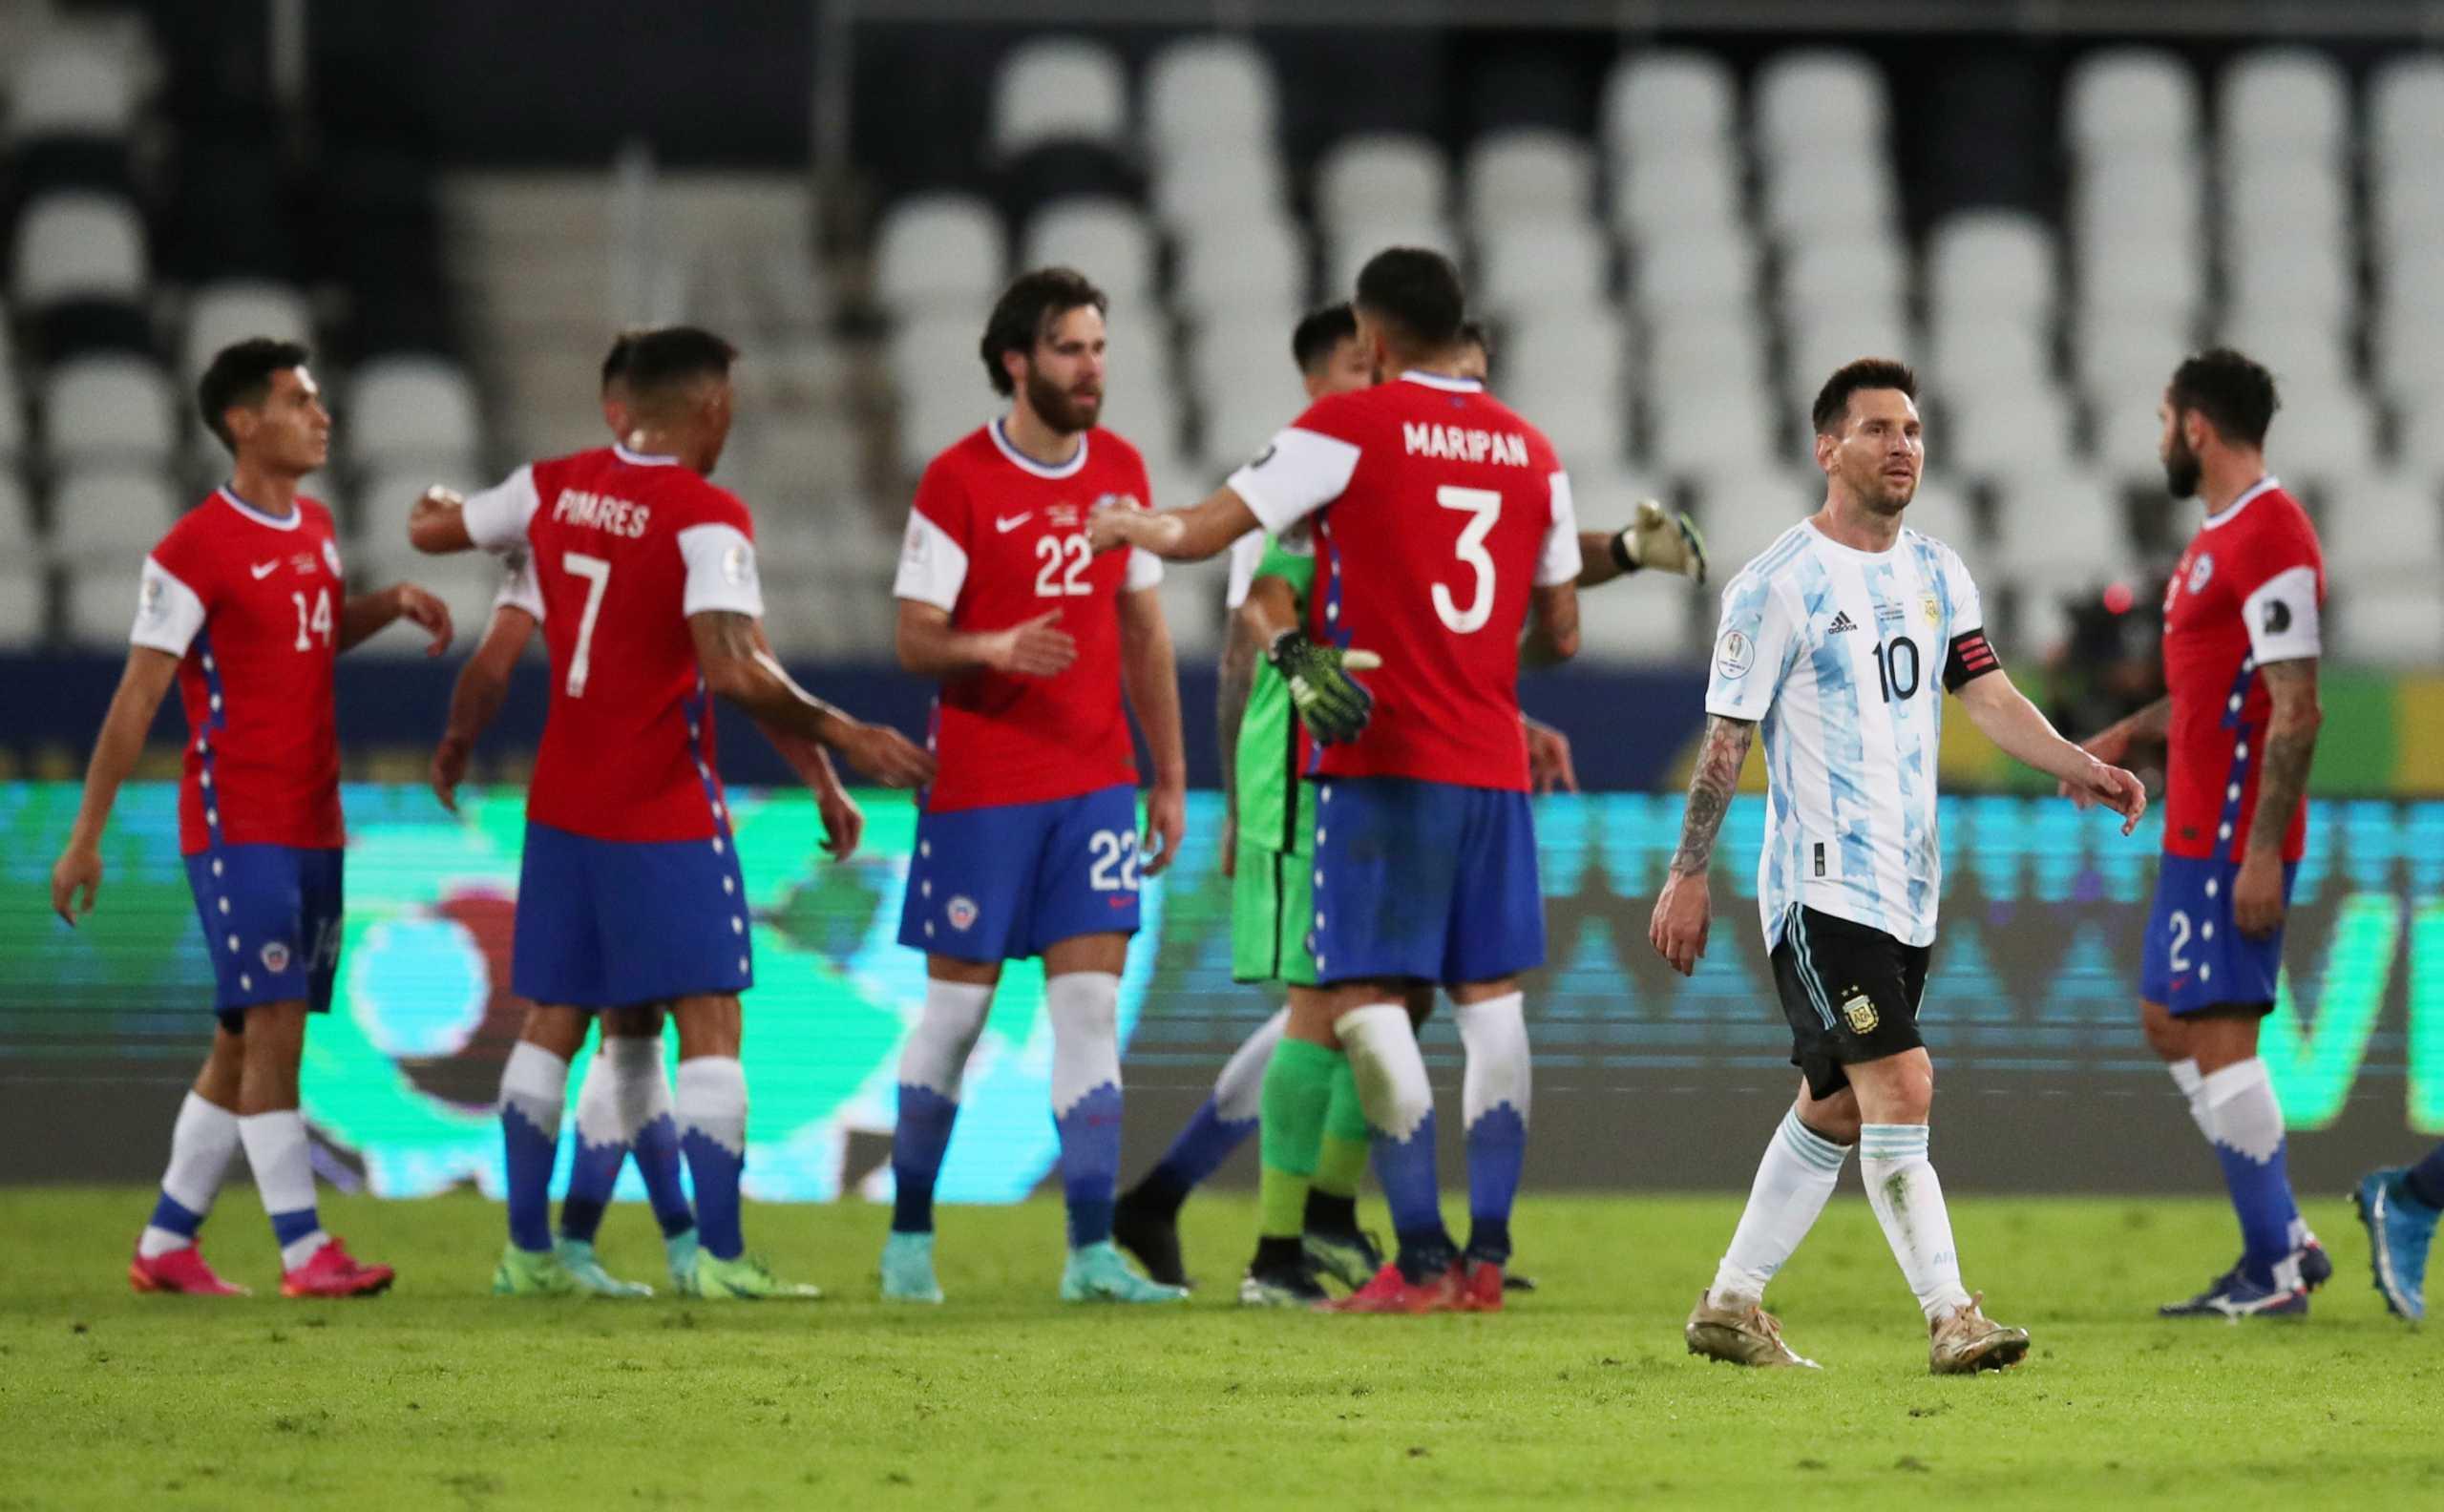 Copa America: Ξεκίνησε με «γκέλα» παρά την γκολάρα Μέσι η Αργεντινή – Νίκη για την Παραγουάη